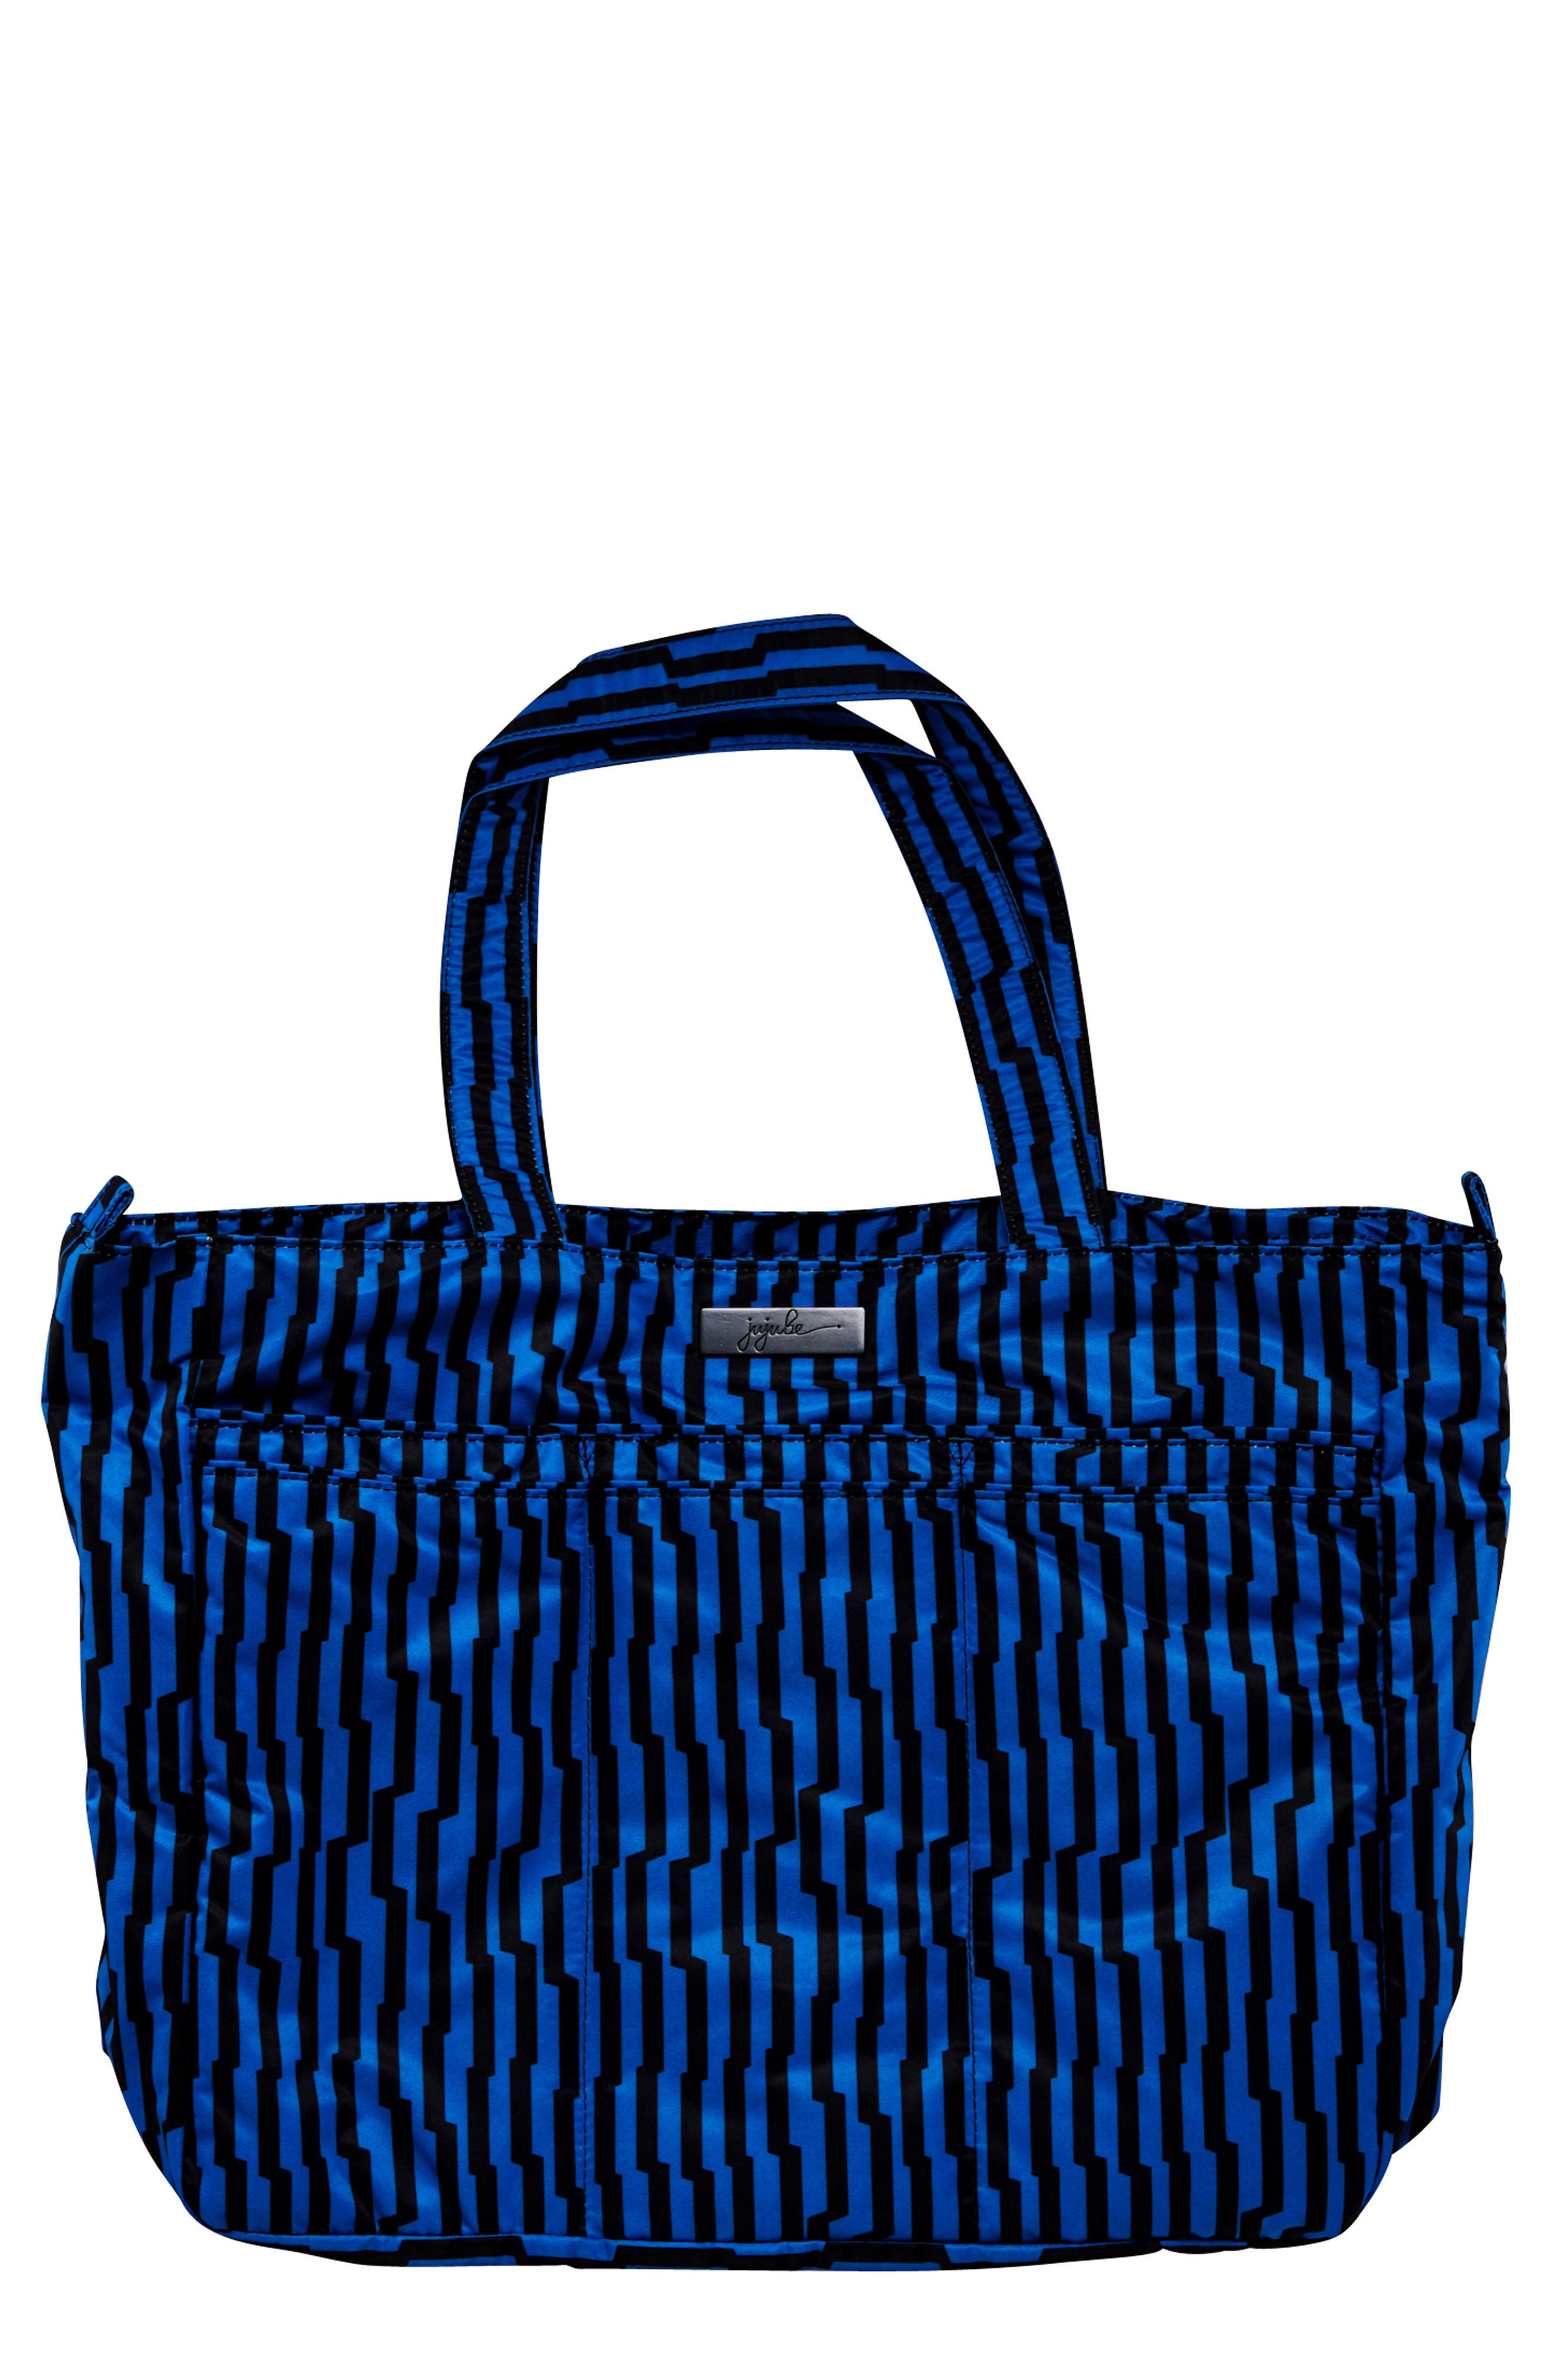 Alternate Image 1 Selected - Ju-Ju-Be 'Super Be - Onyx Collection' Diaper Bag